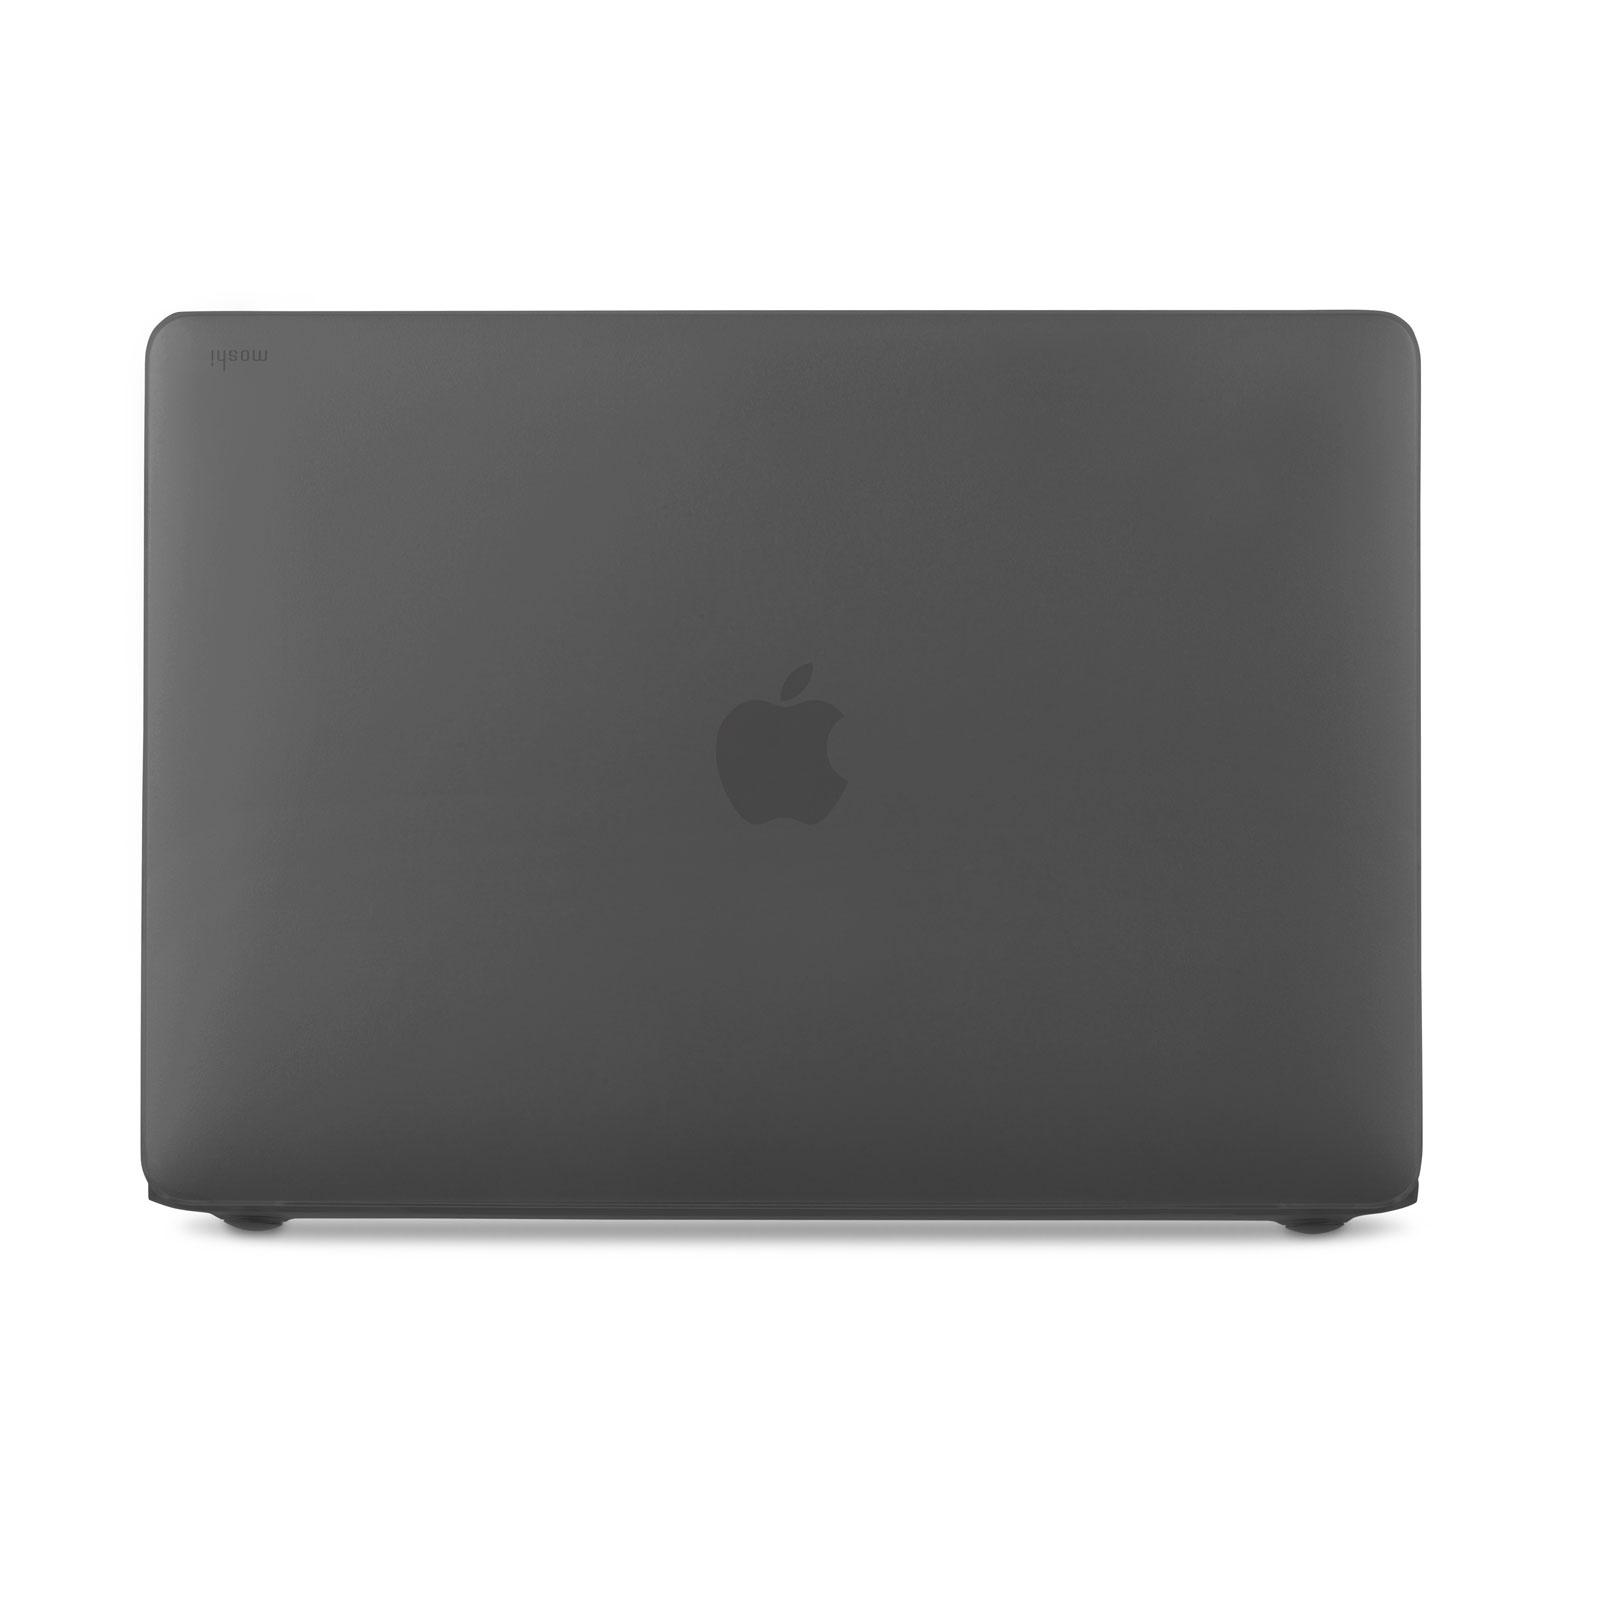 Чехол Moshi для MacBook Air 11